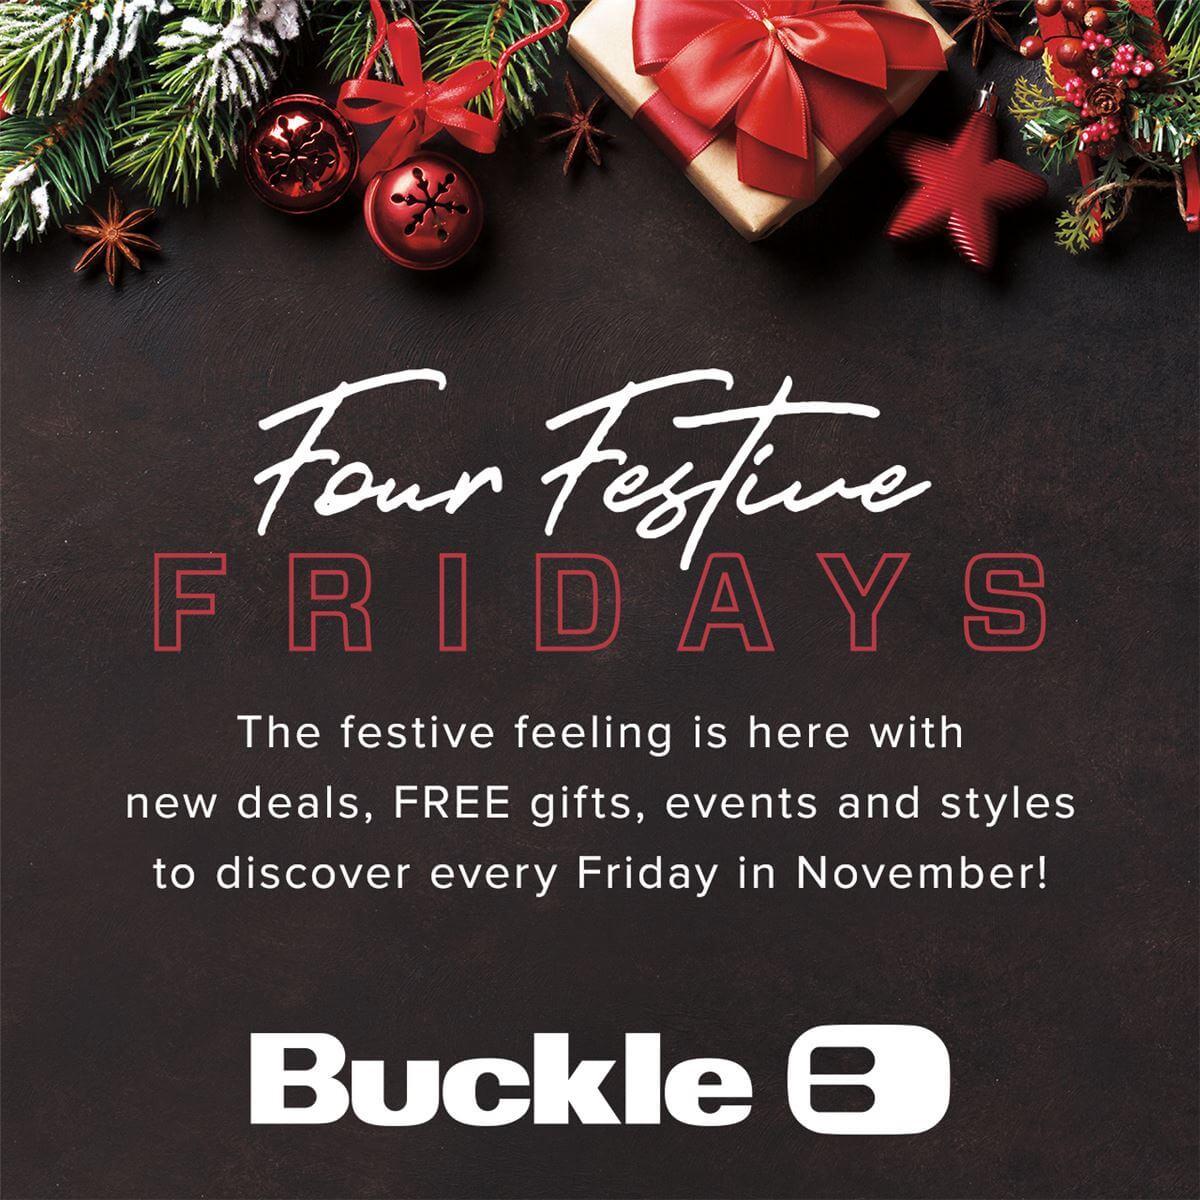 Four Festive Fridays Poster